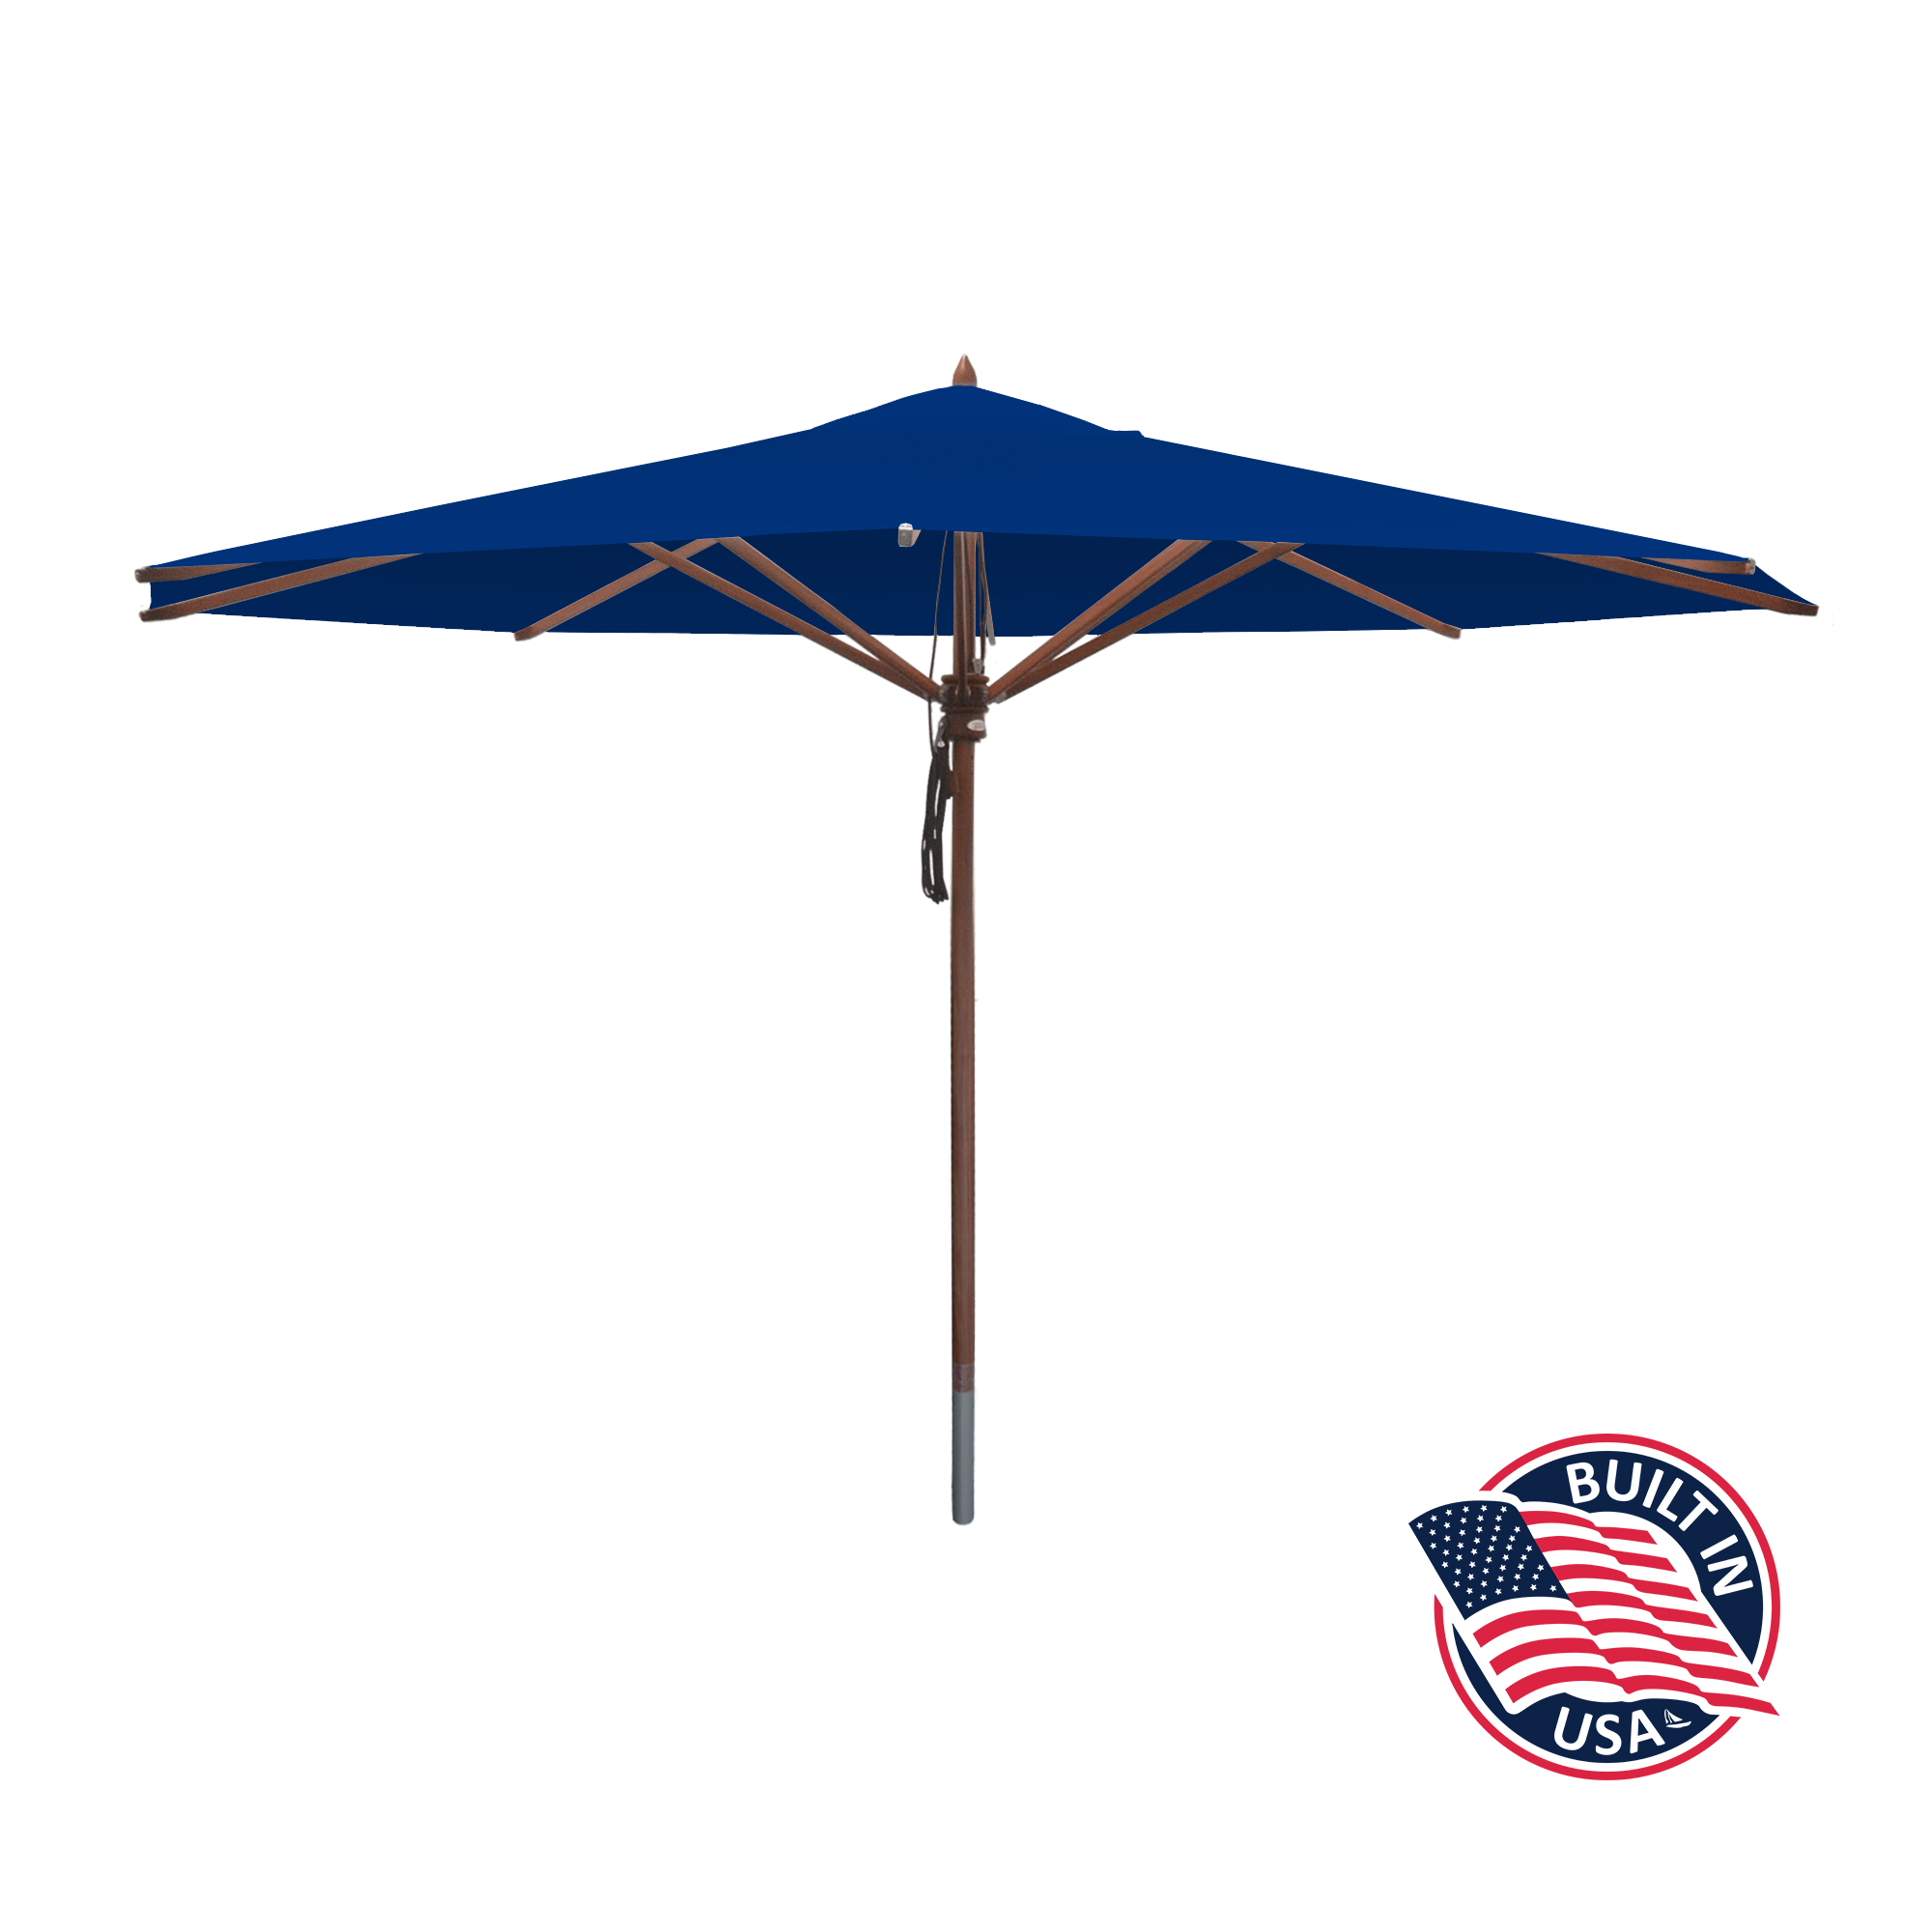 13' Octagon Patio Umbrella